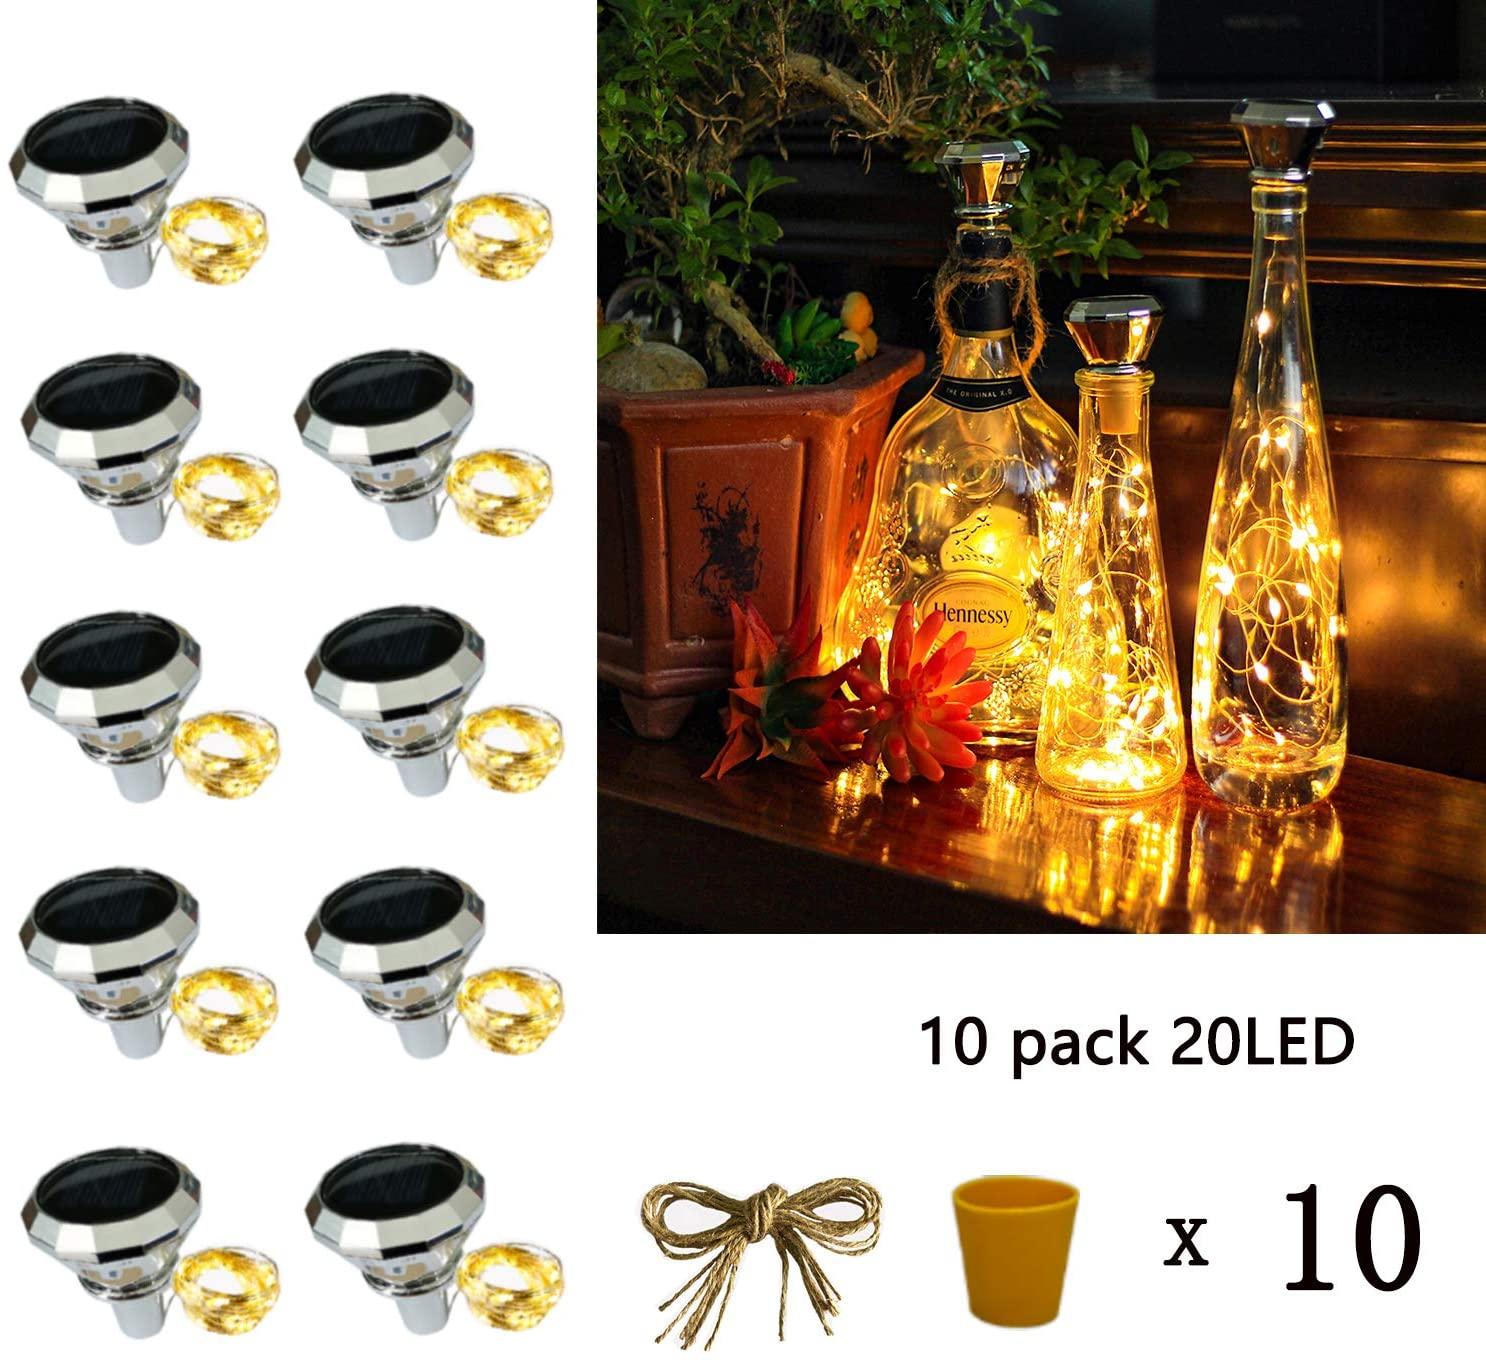 Starry Love bottle lights Solar Wine Bottle Lights 10 Packs 20LED Outdoor Waterproof Fairy Light Strings for Recycling Wine Bottle Decoration